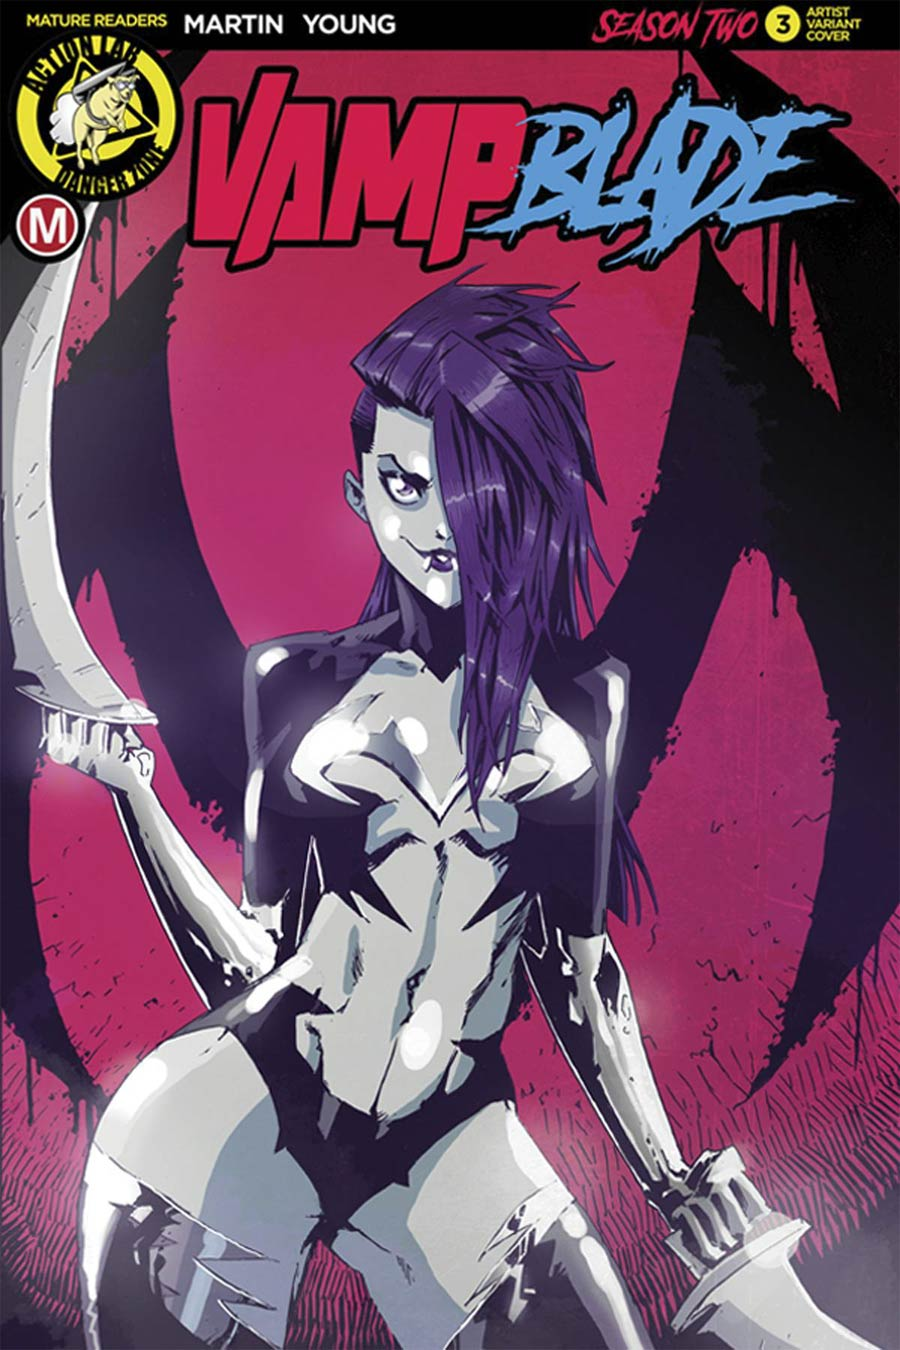 Vampblade Season 2 #3 Cover C Variant Marco Maccagni Artist Cover